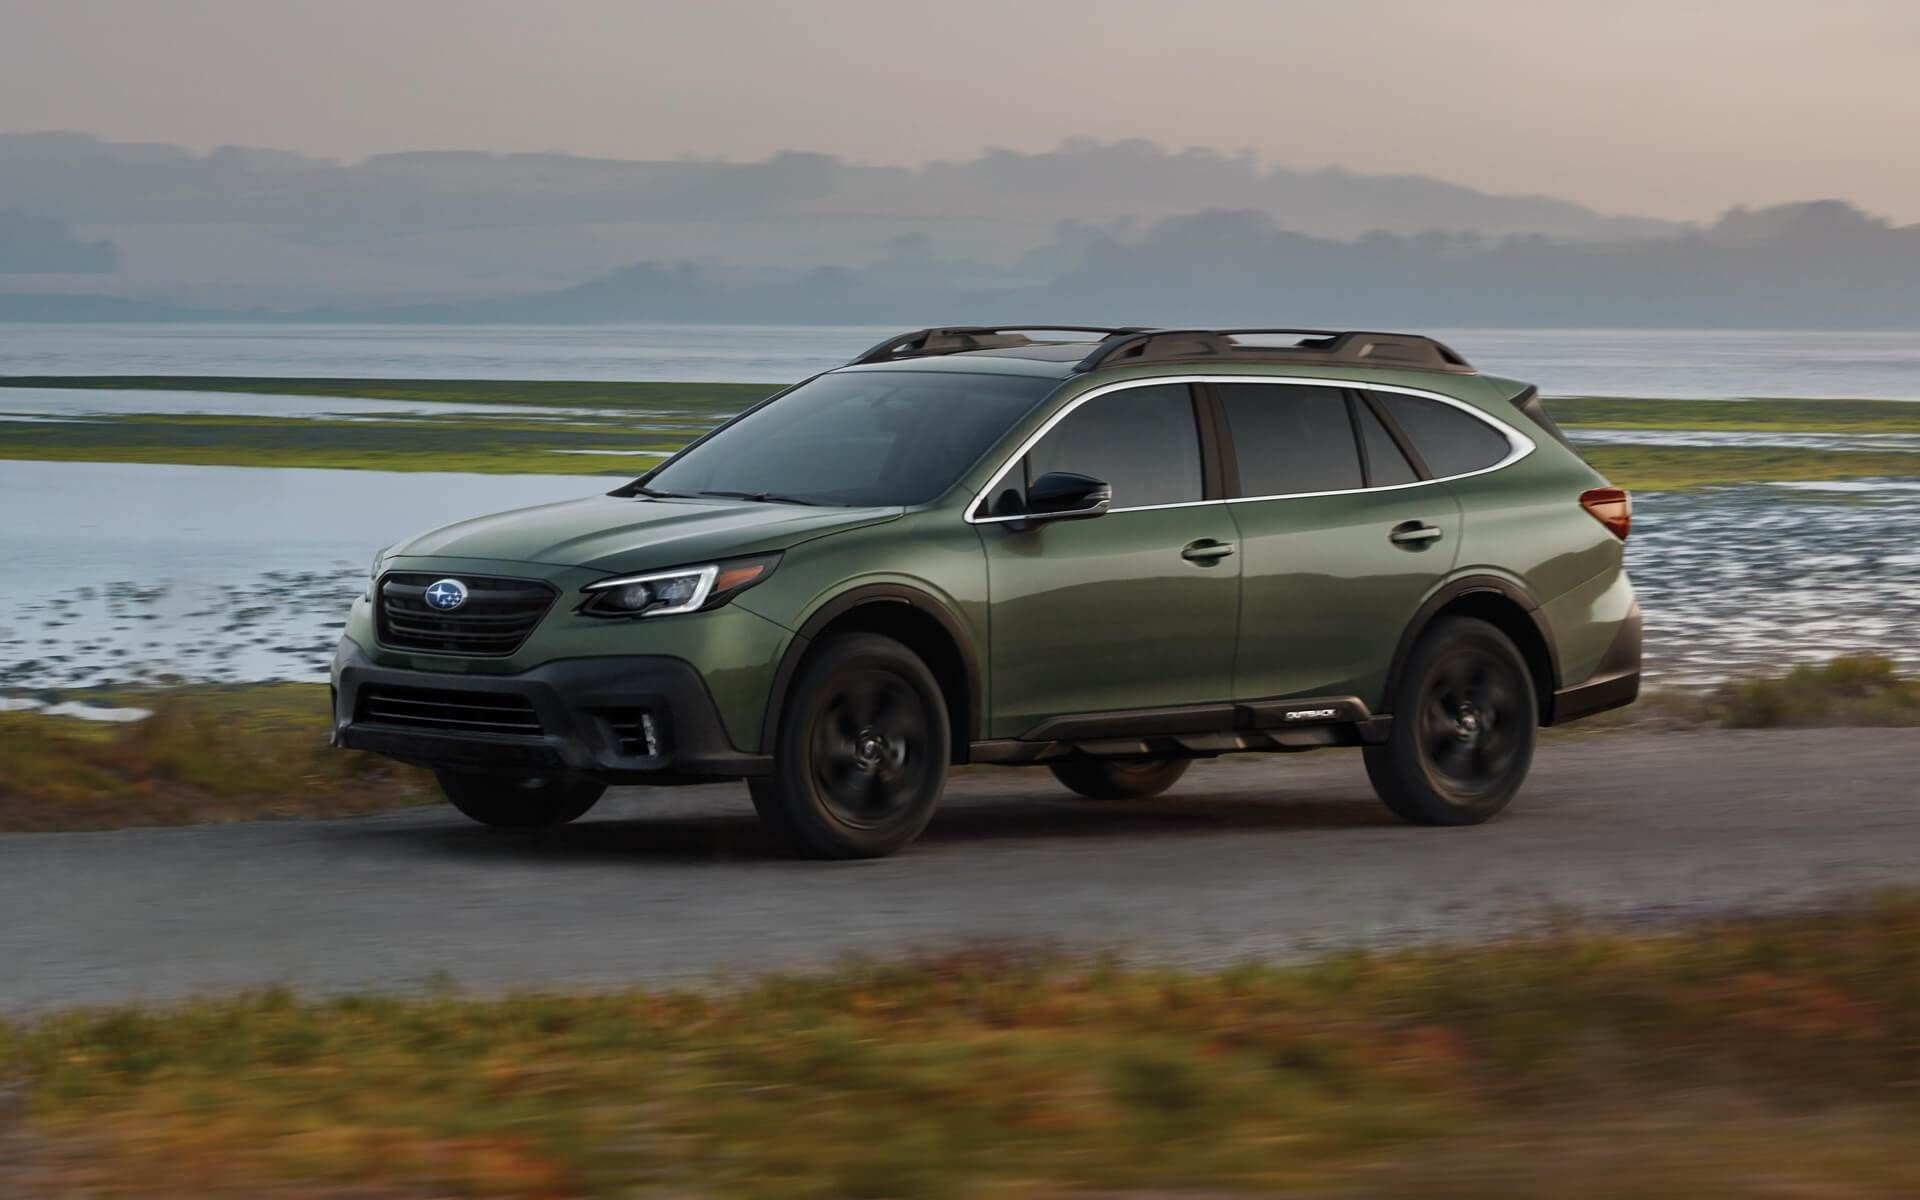 2020 Subaru Outback 2840k Subaru outback, Subaru, Outback